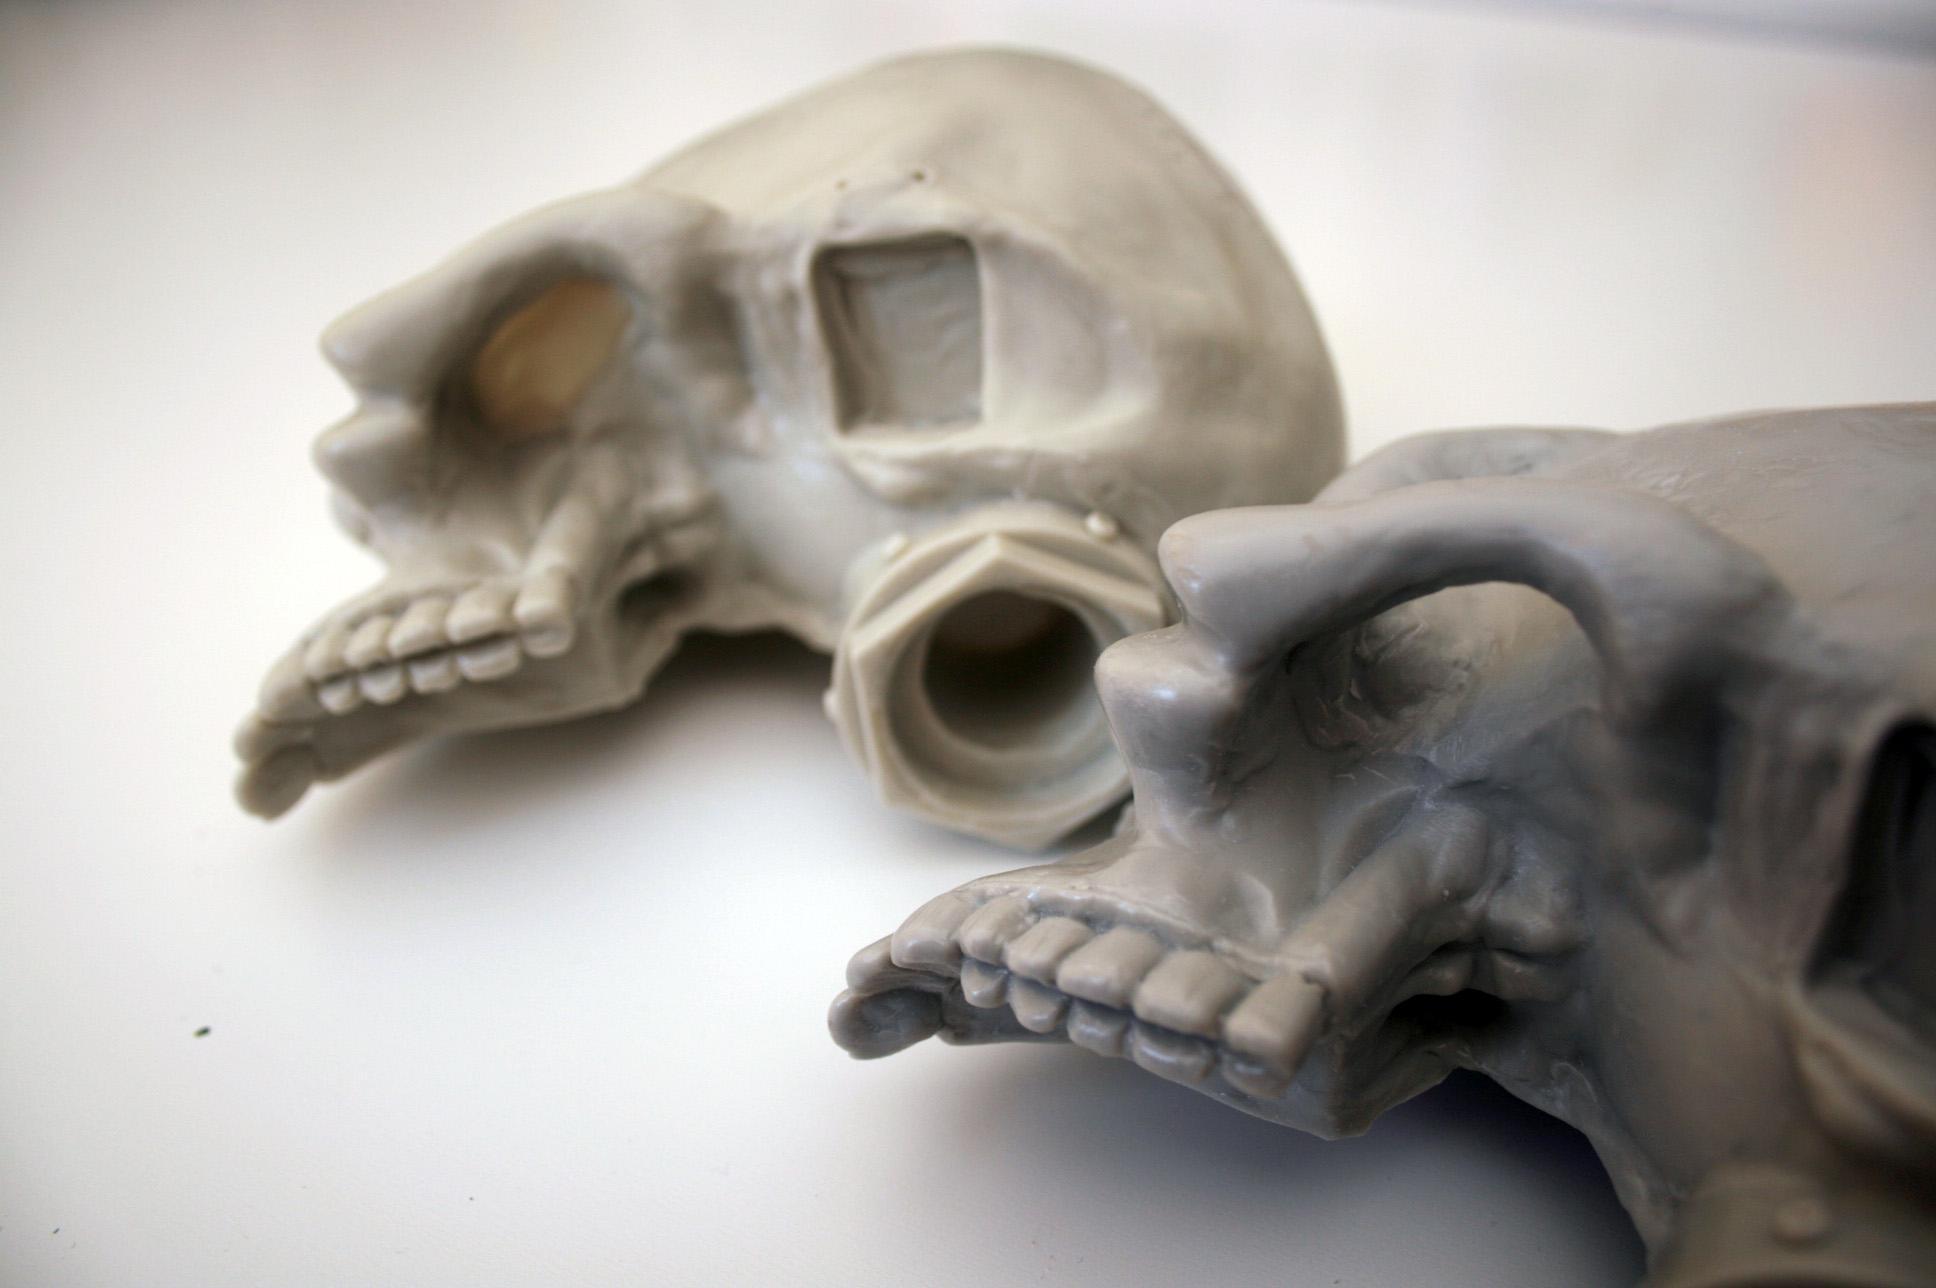 Companion skull x2